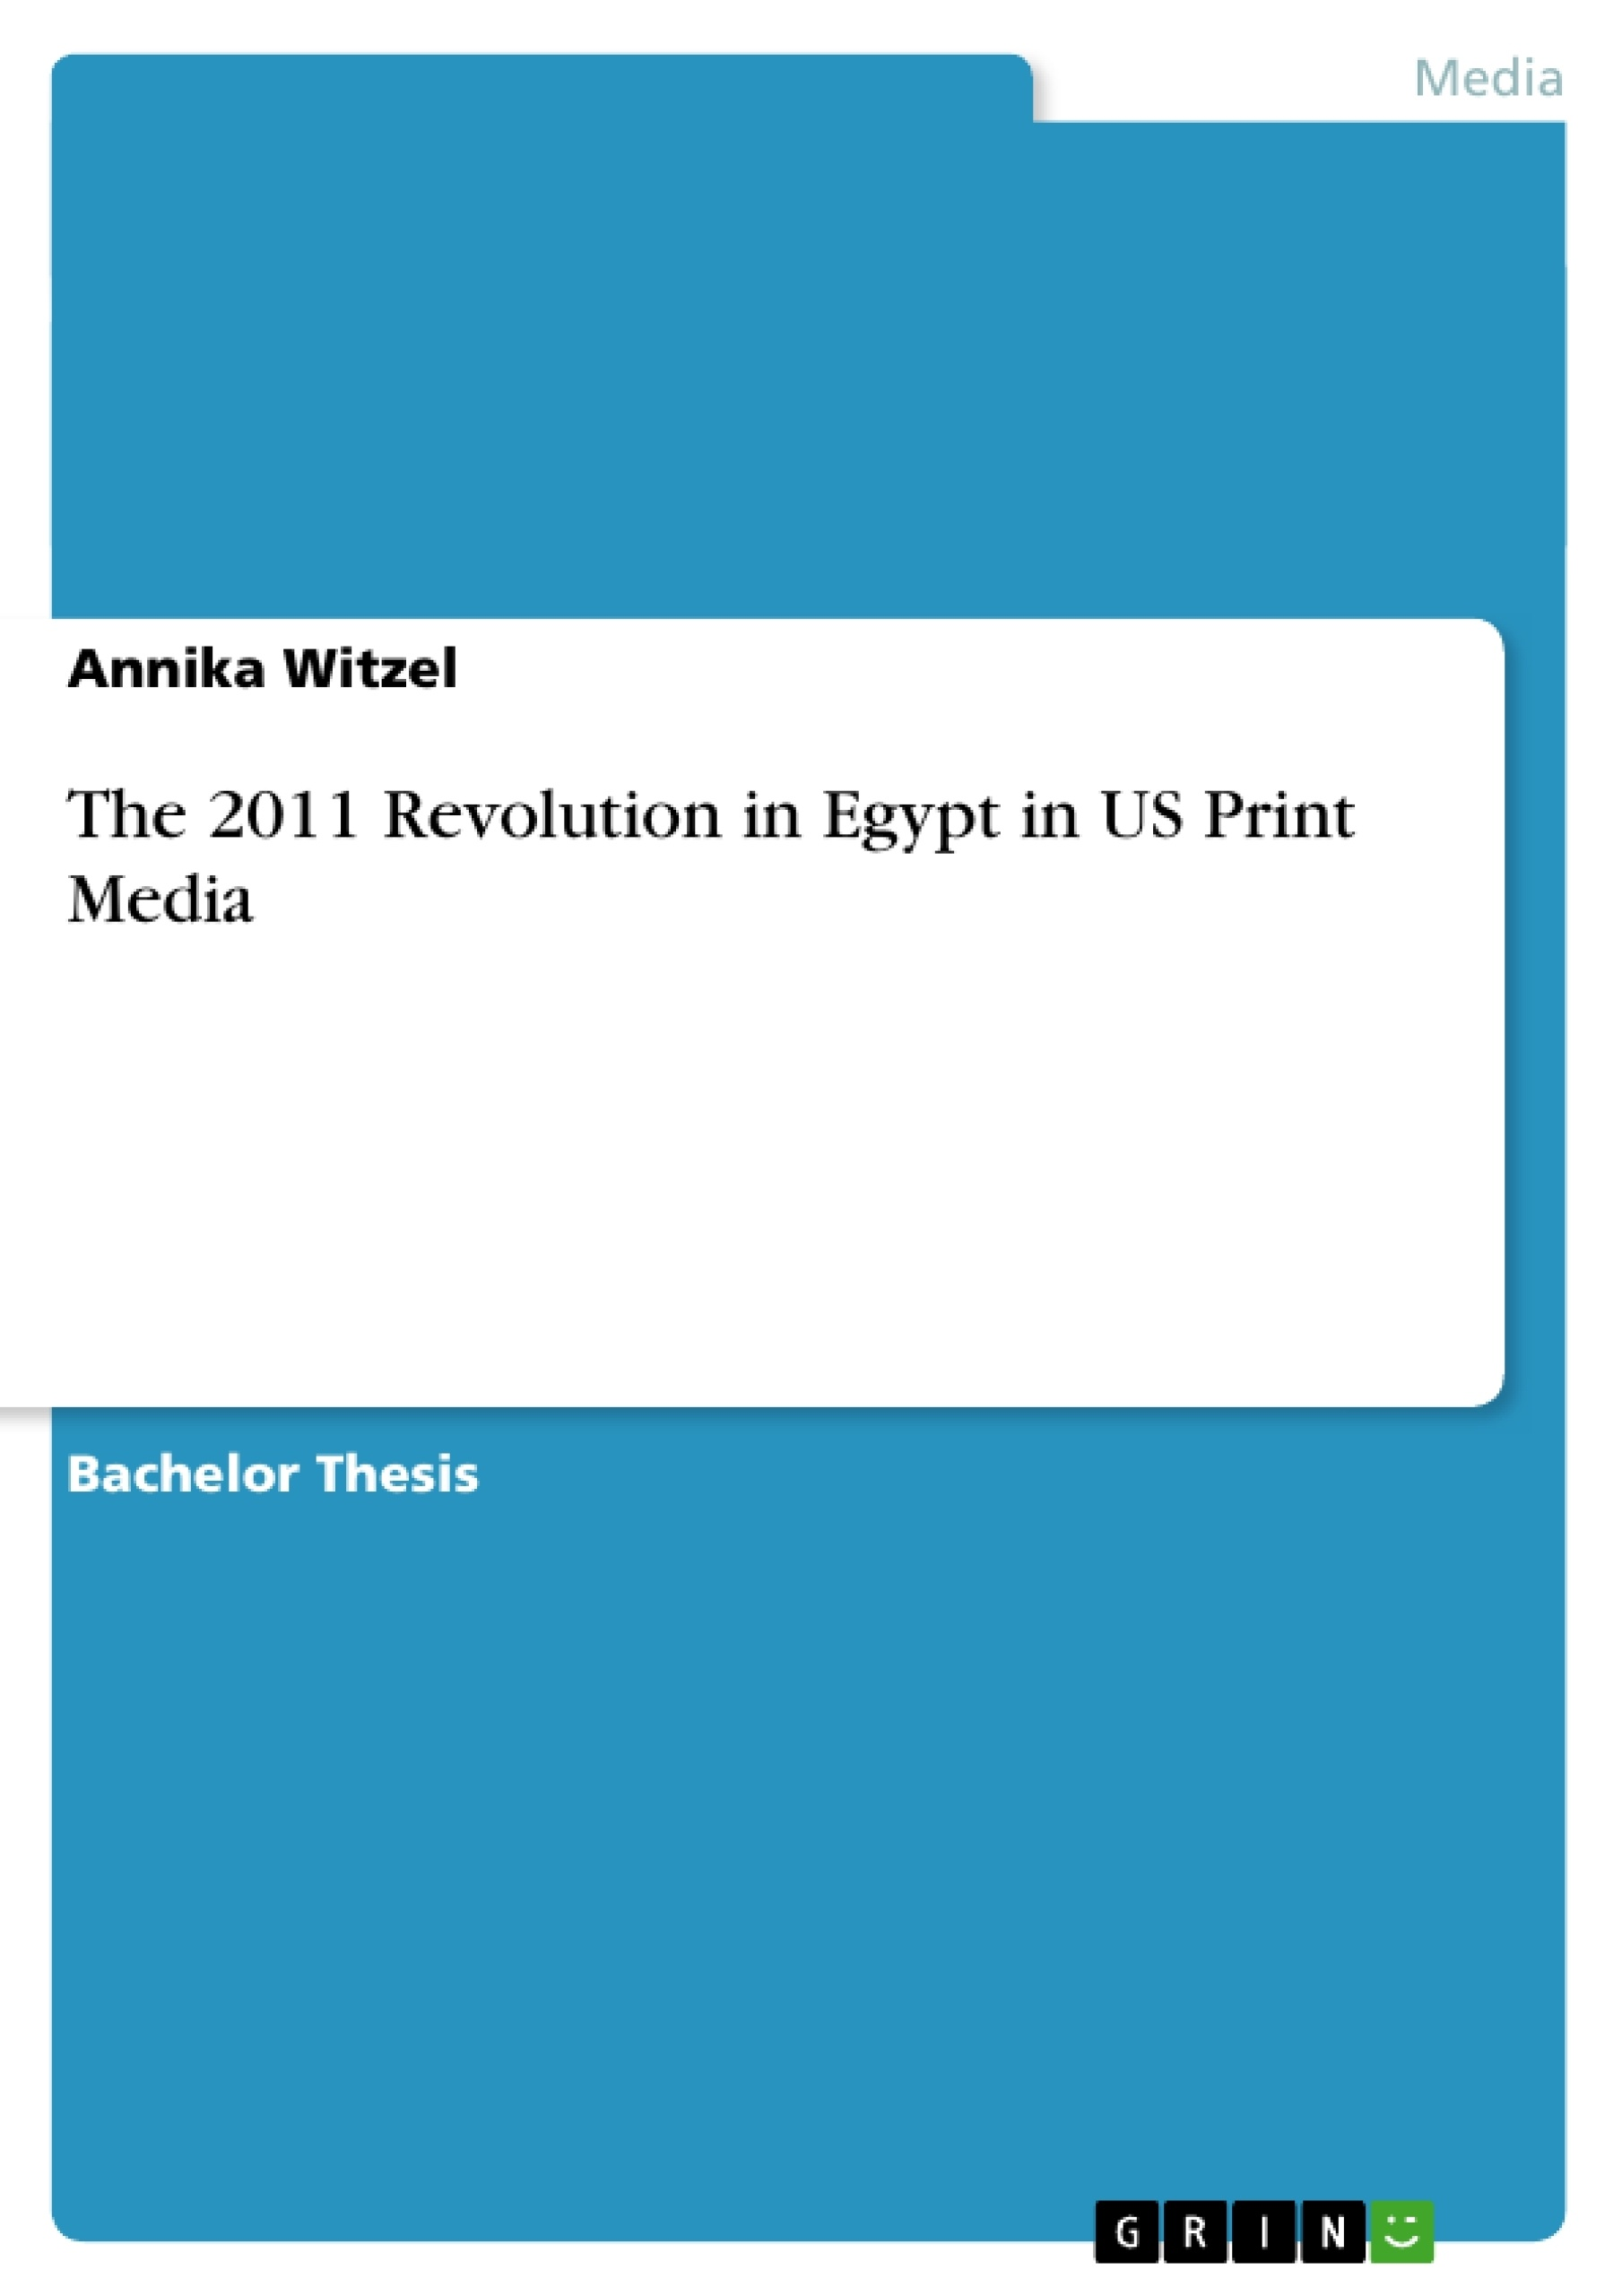 Title: The 2011 Revolution in Egypt in US Print Media